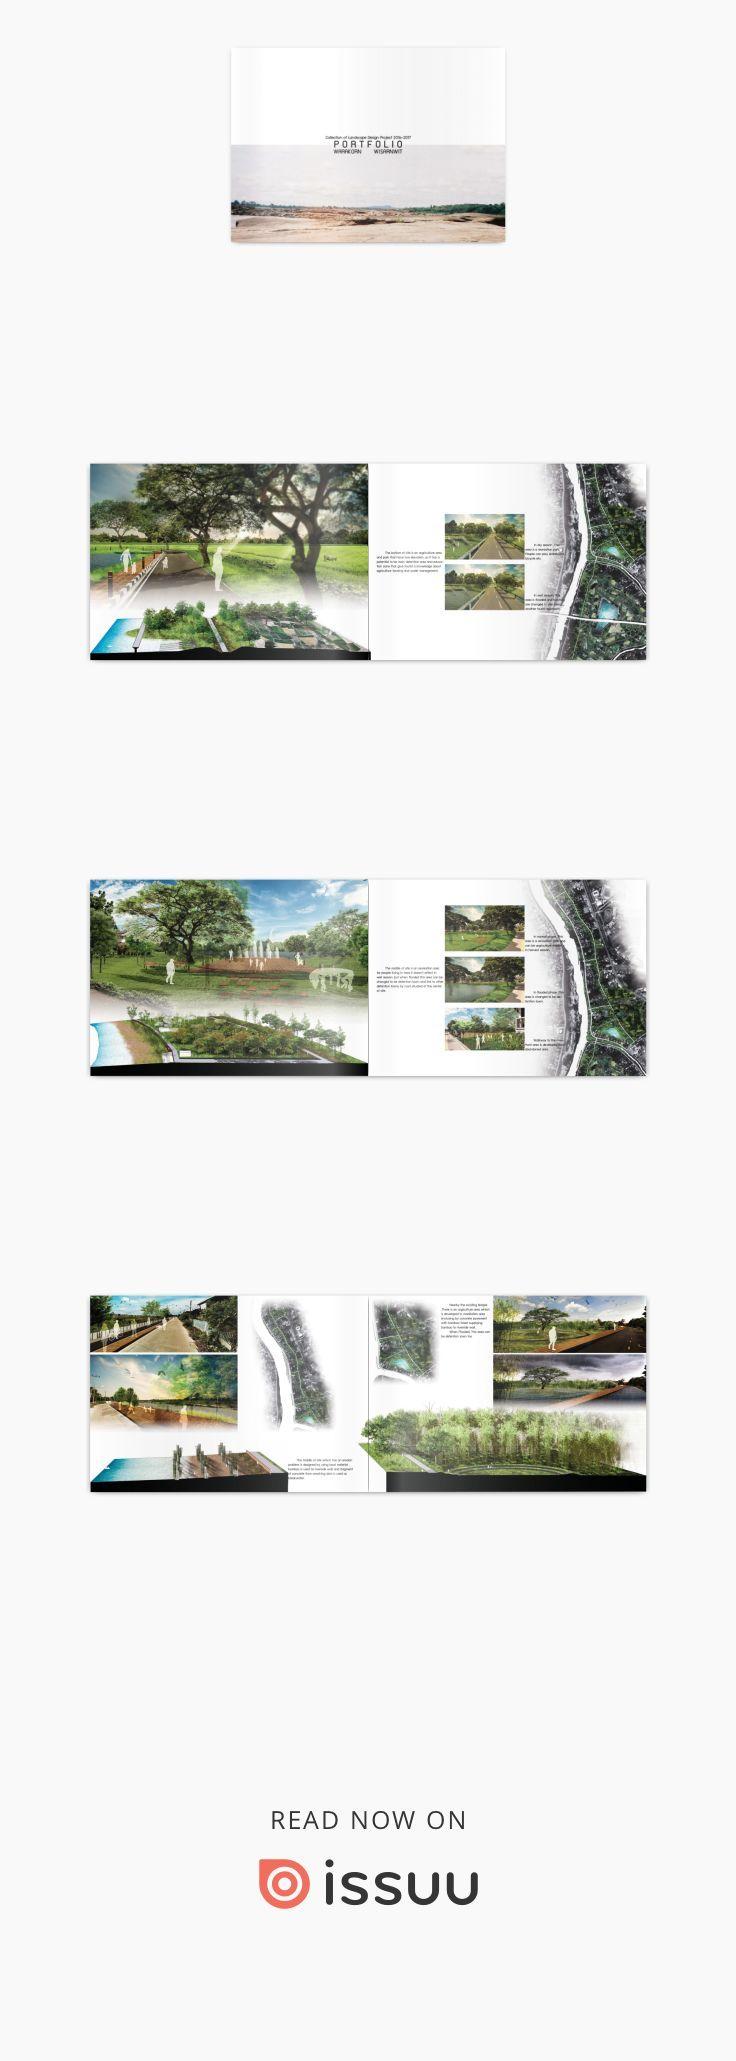 Landscape Architecture Portfolio Warakorn Landscape Architecture Portfolio Landscape Architecture Design Architecture Portfolio